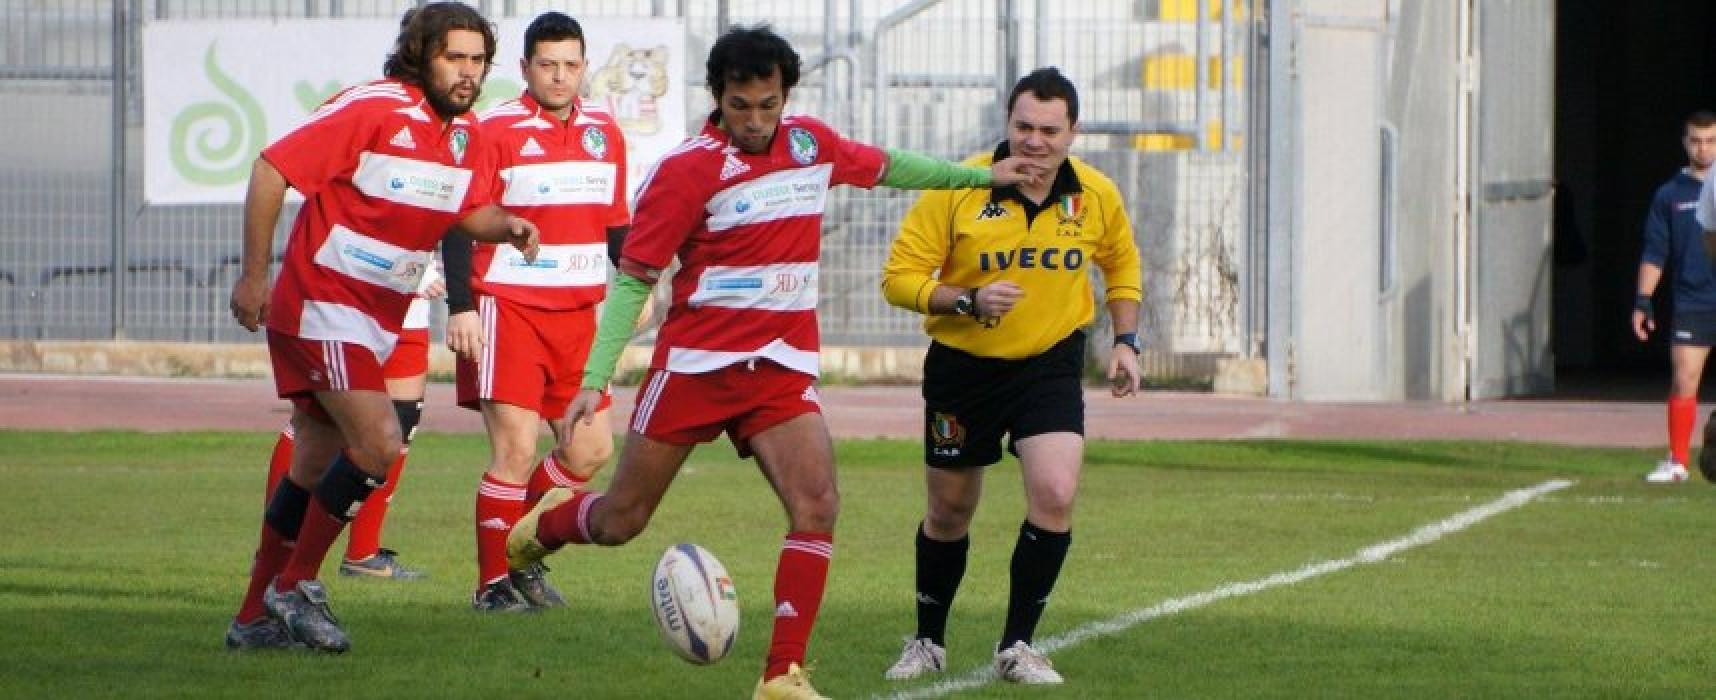 Rugby, Draghi Bat sconfitti in casa dall'Amatori Taranto